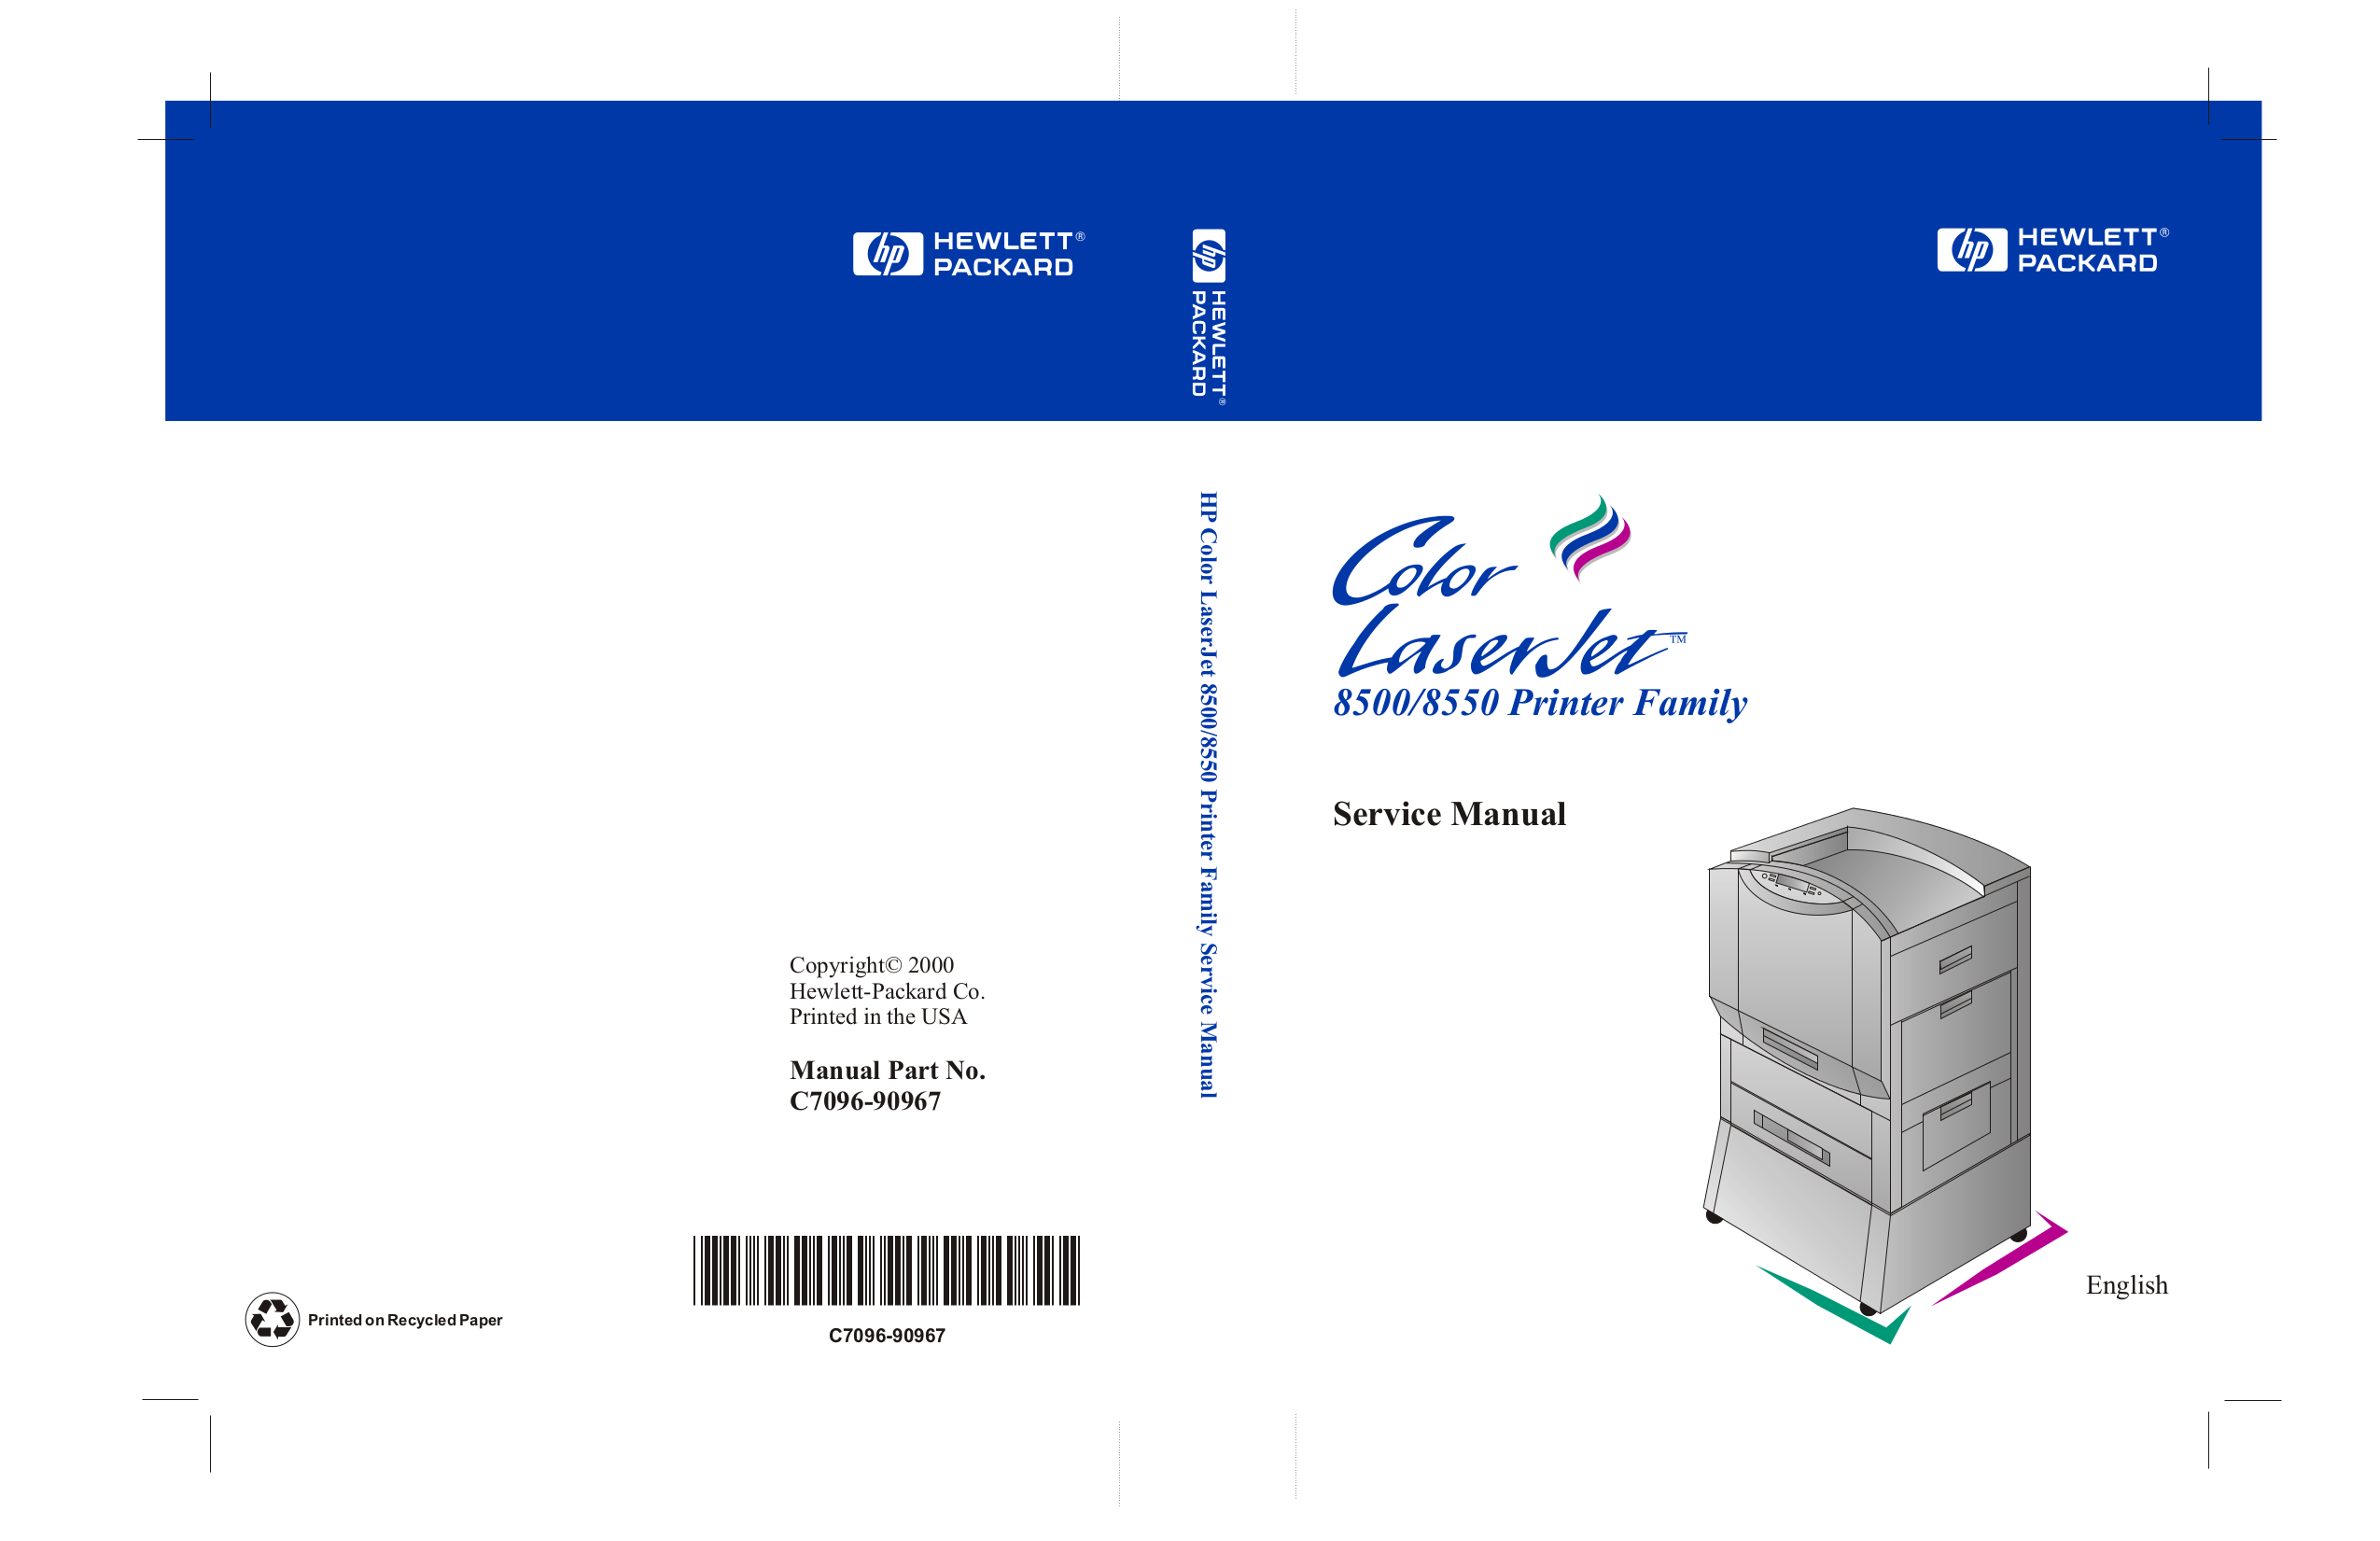 pdf for HP Printer Laserjet,Color Laserjet 8550dn manual